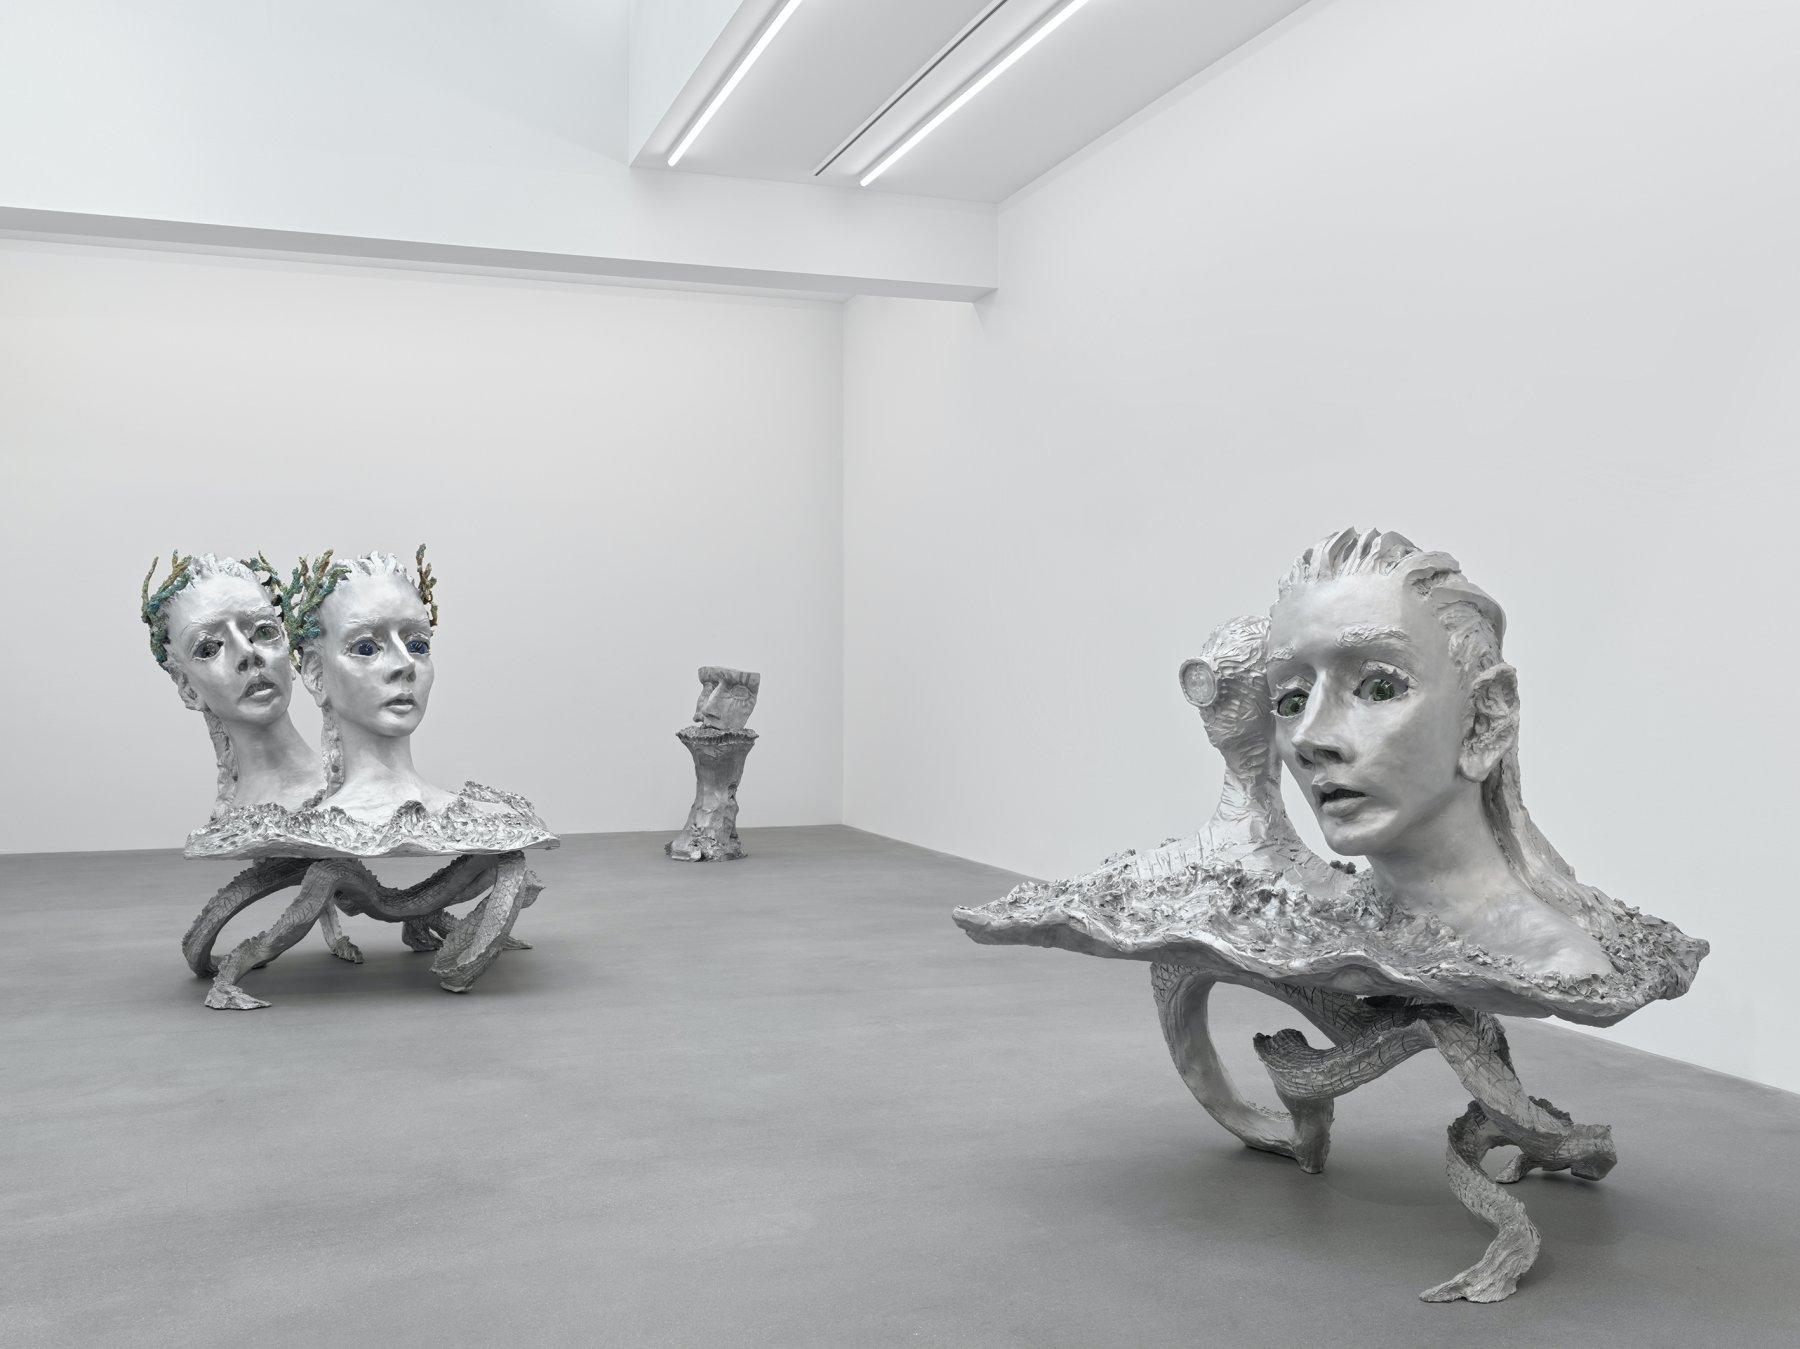 Galerie Eva Presenhuber Waldmanstrasse Jean-Marie Appriou 1